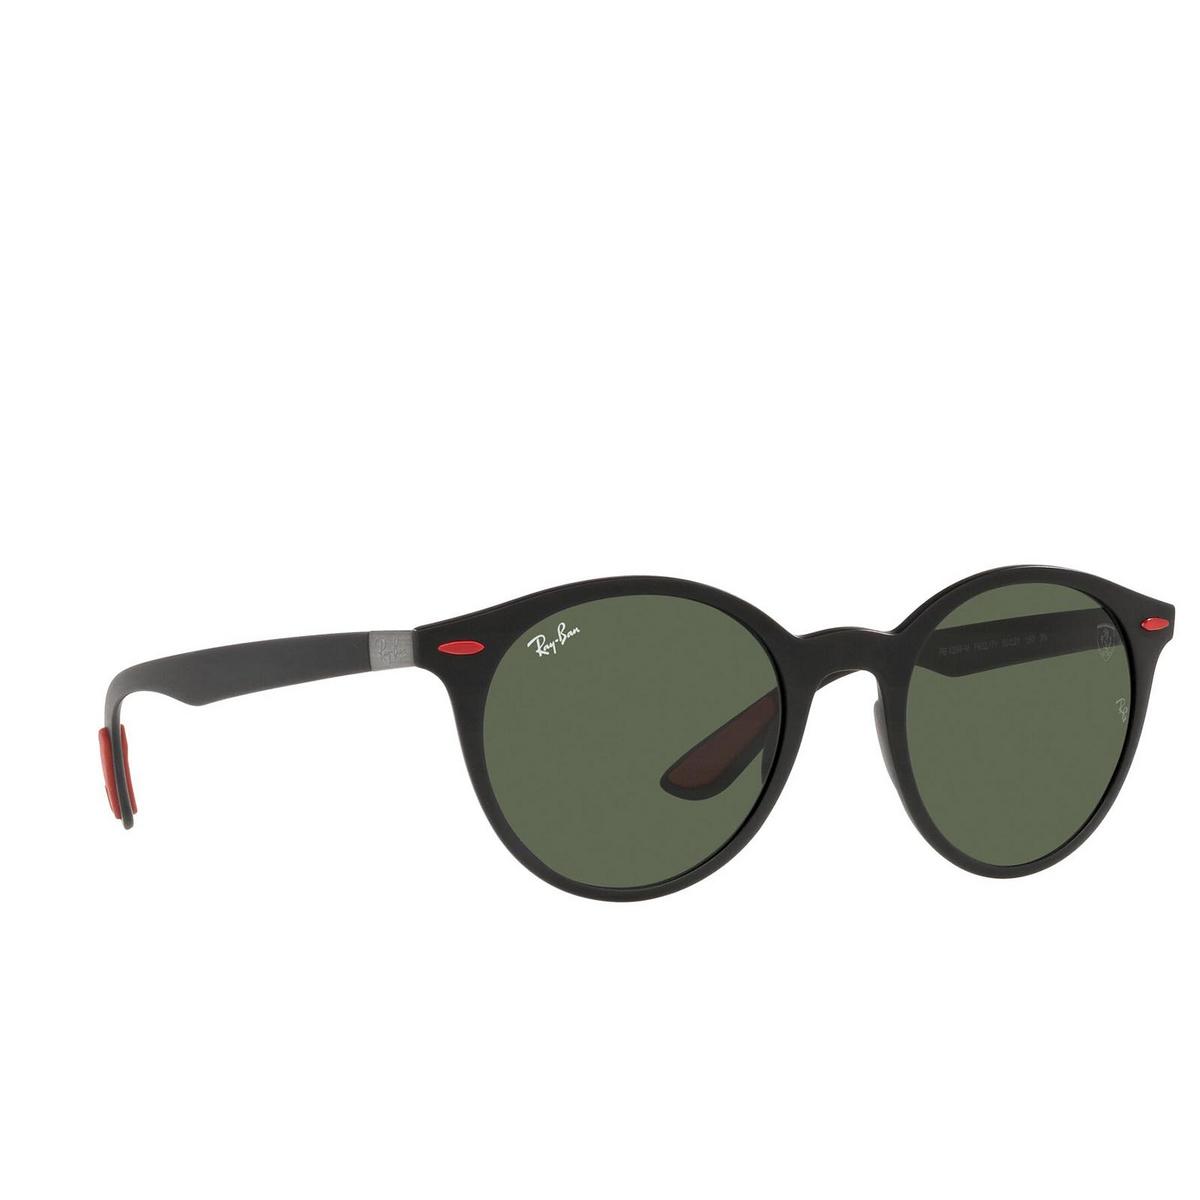 Ray-Ban® Round Sunglasses: RB4296M color Matte Black F60271.